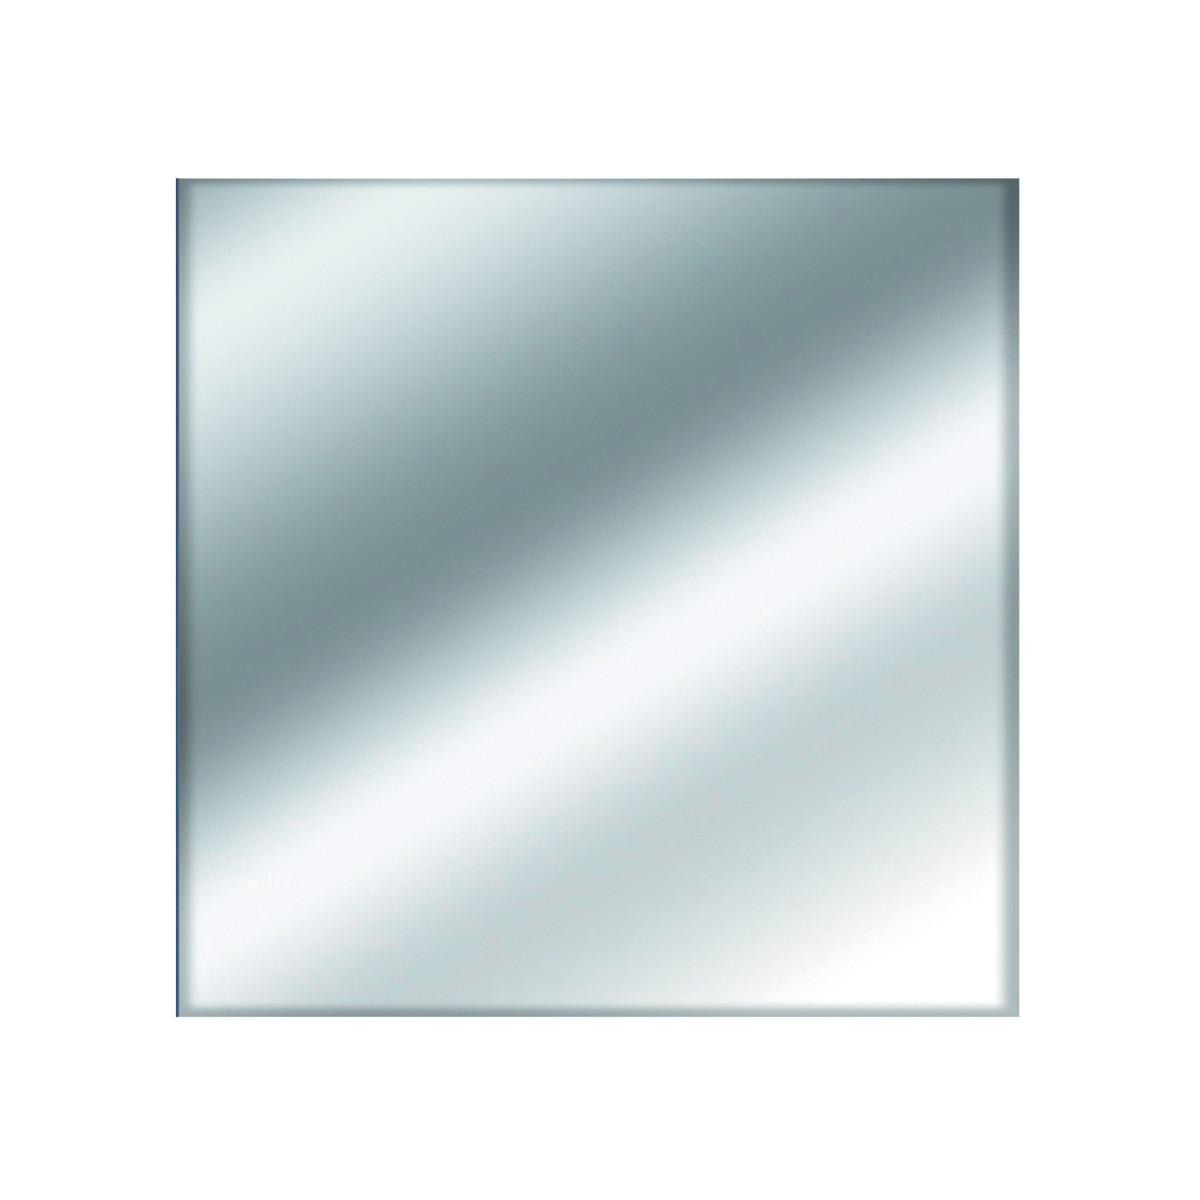 Vetro sintetico mm 2 0 50x100 polimark pz prezzo e for Vetro sintetico leroy merlin